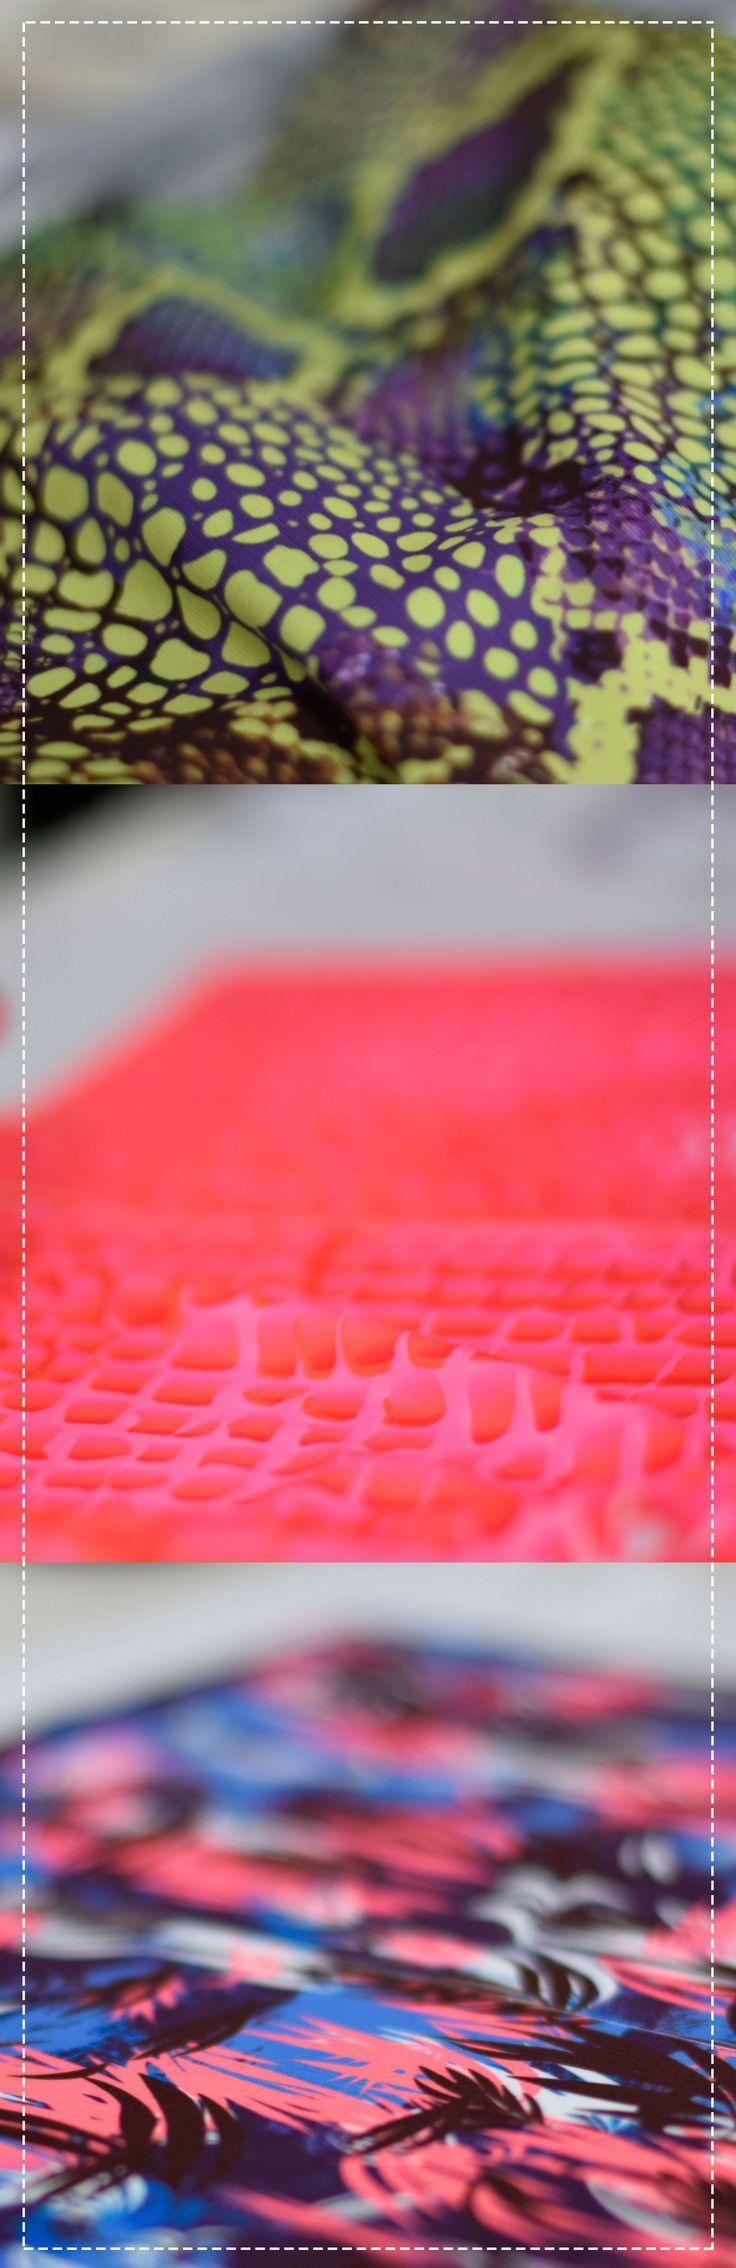 Weekend Safari@GSEA FashionGroup#apparelproduction#apparelmanufacturing#clothing#fashion#clothingmanufacturer#fashionbrand#madeinperu#freetrade#nyc#apparel#manufacturing#manufacturingservices#clothingproduction#embroidery#sublimation#screenprinting